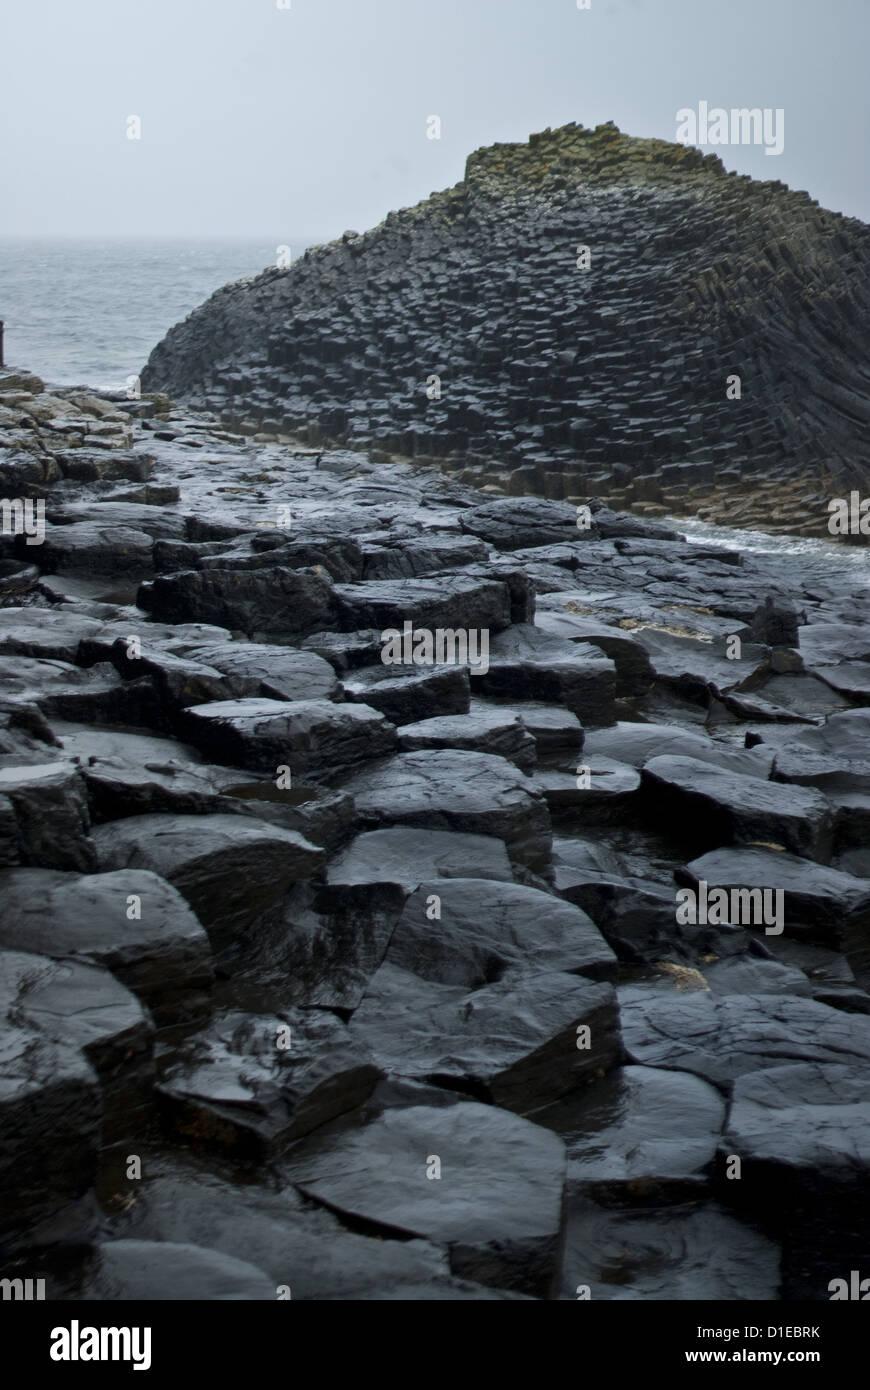 Fingal's Cave, Isle of Staffa, Inner Hebrides, Scotland, United Kingdom, Europe - Stock Image